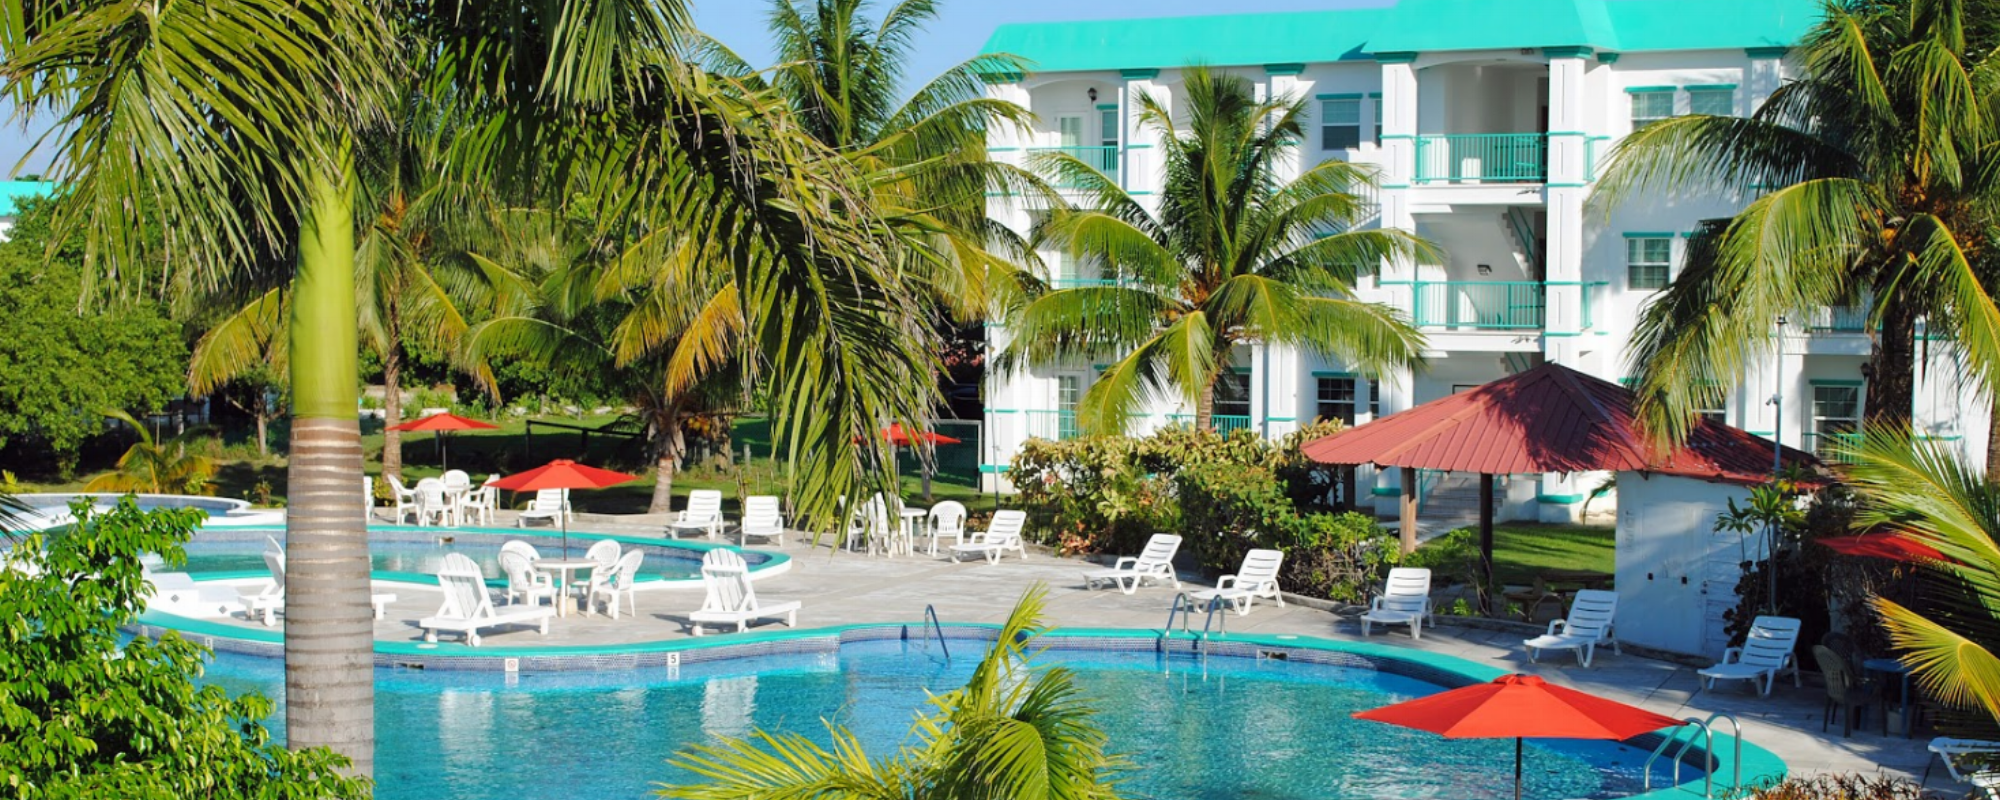 Baymen Gardens Pool